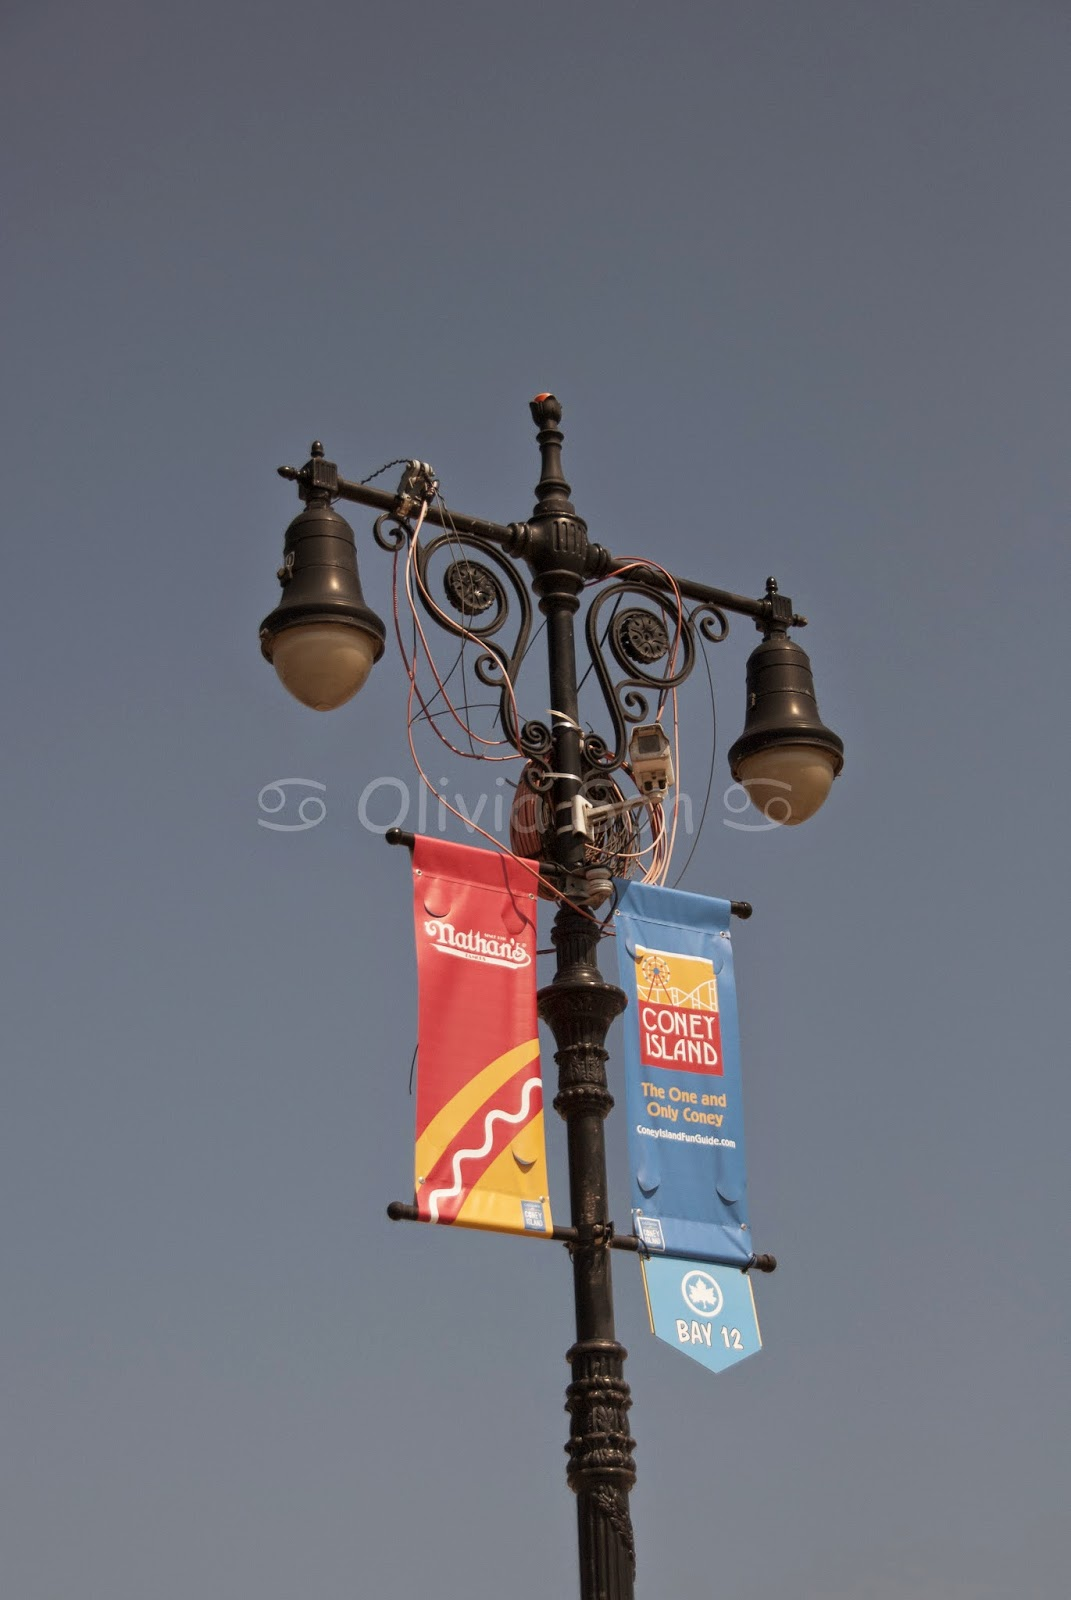 coney island, new york city, usa